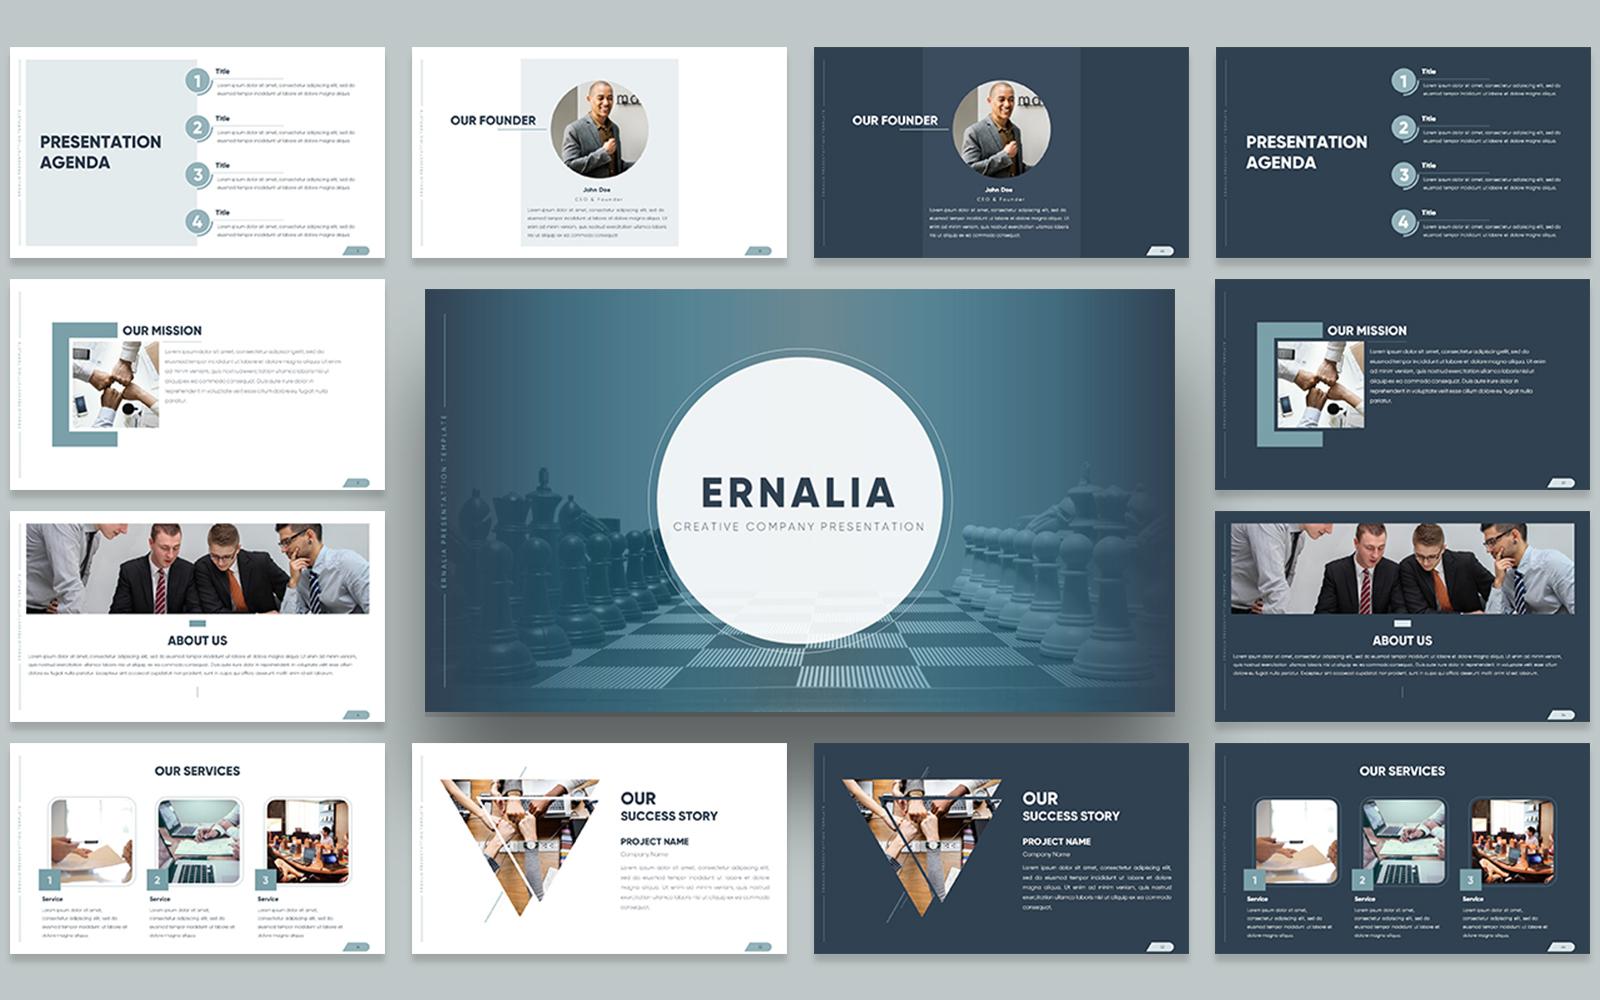 Ernalia Creative Company Presentation PowerPoint Template